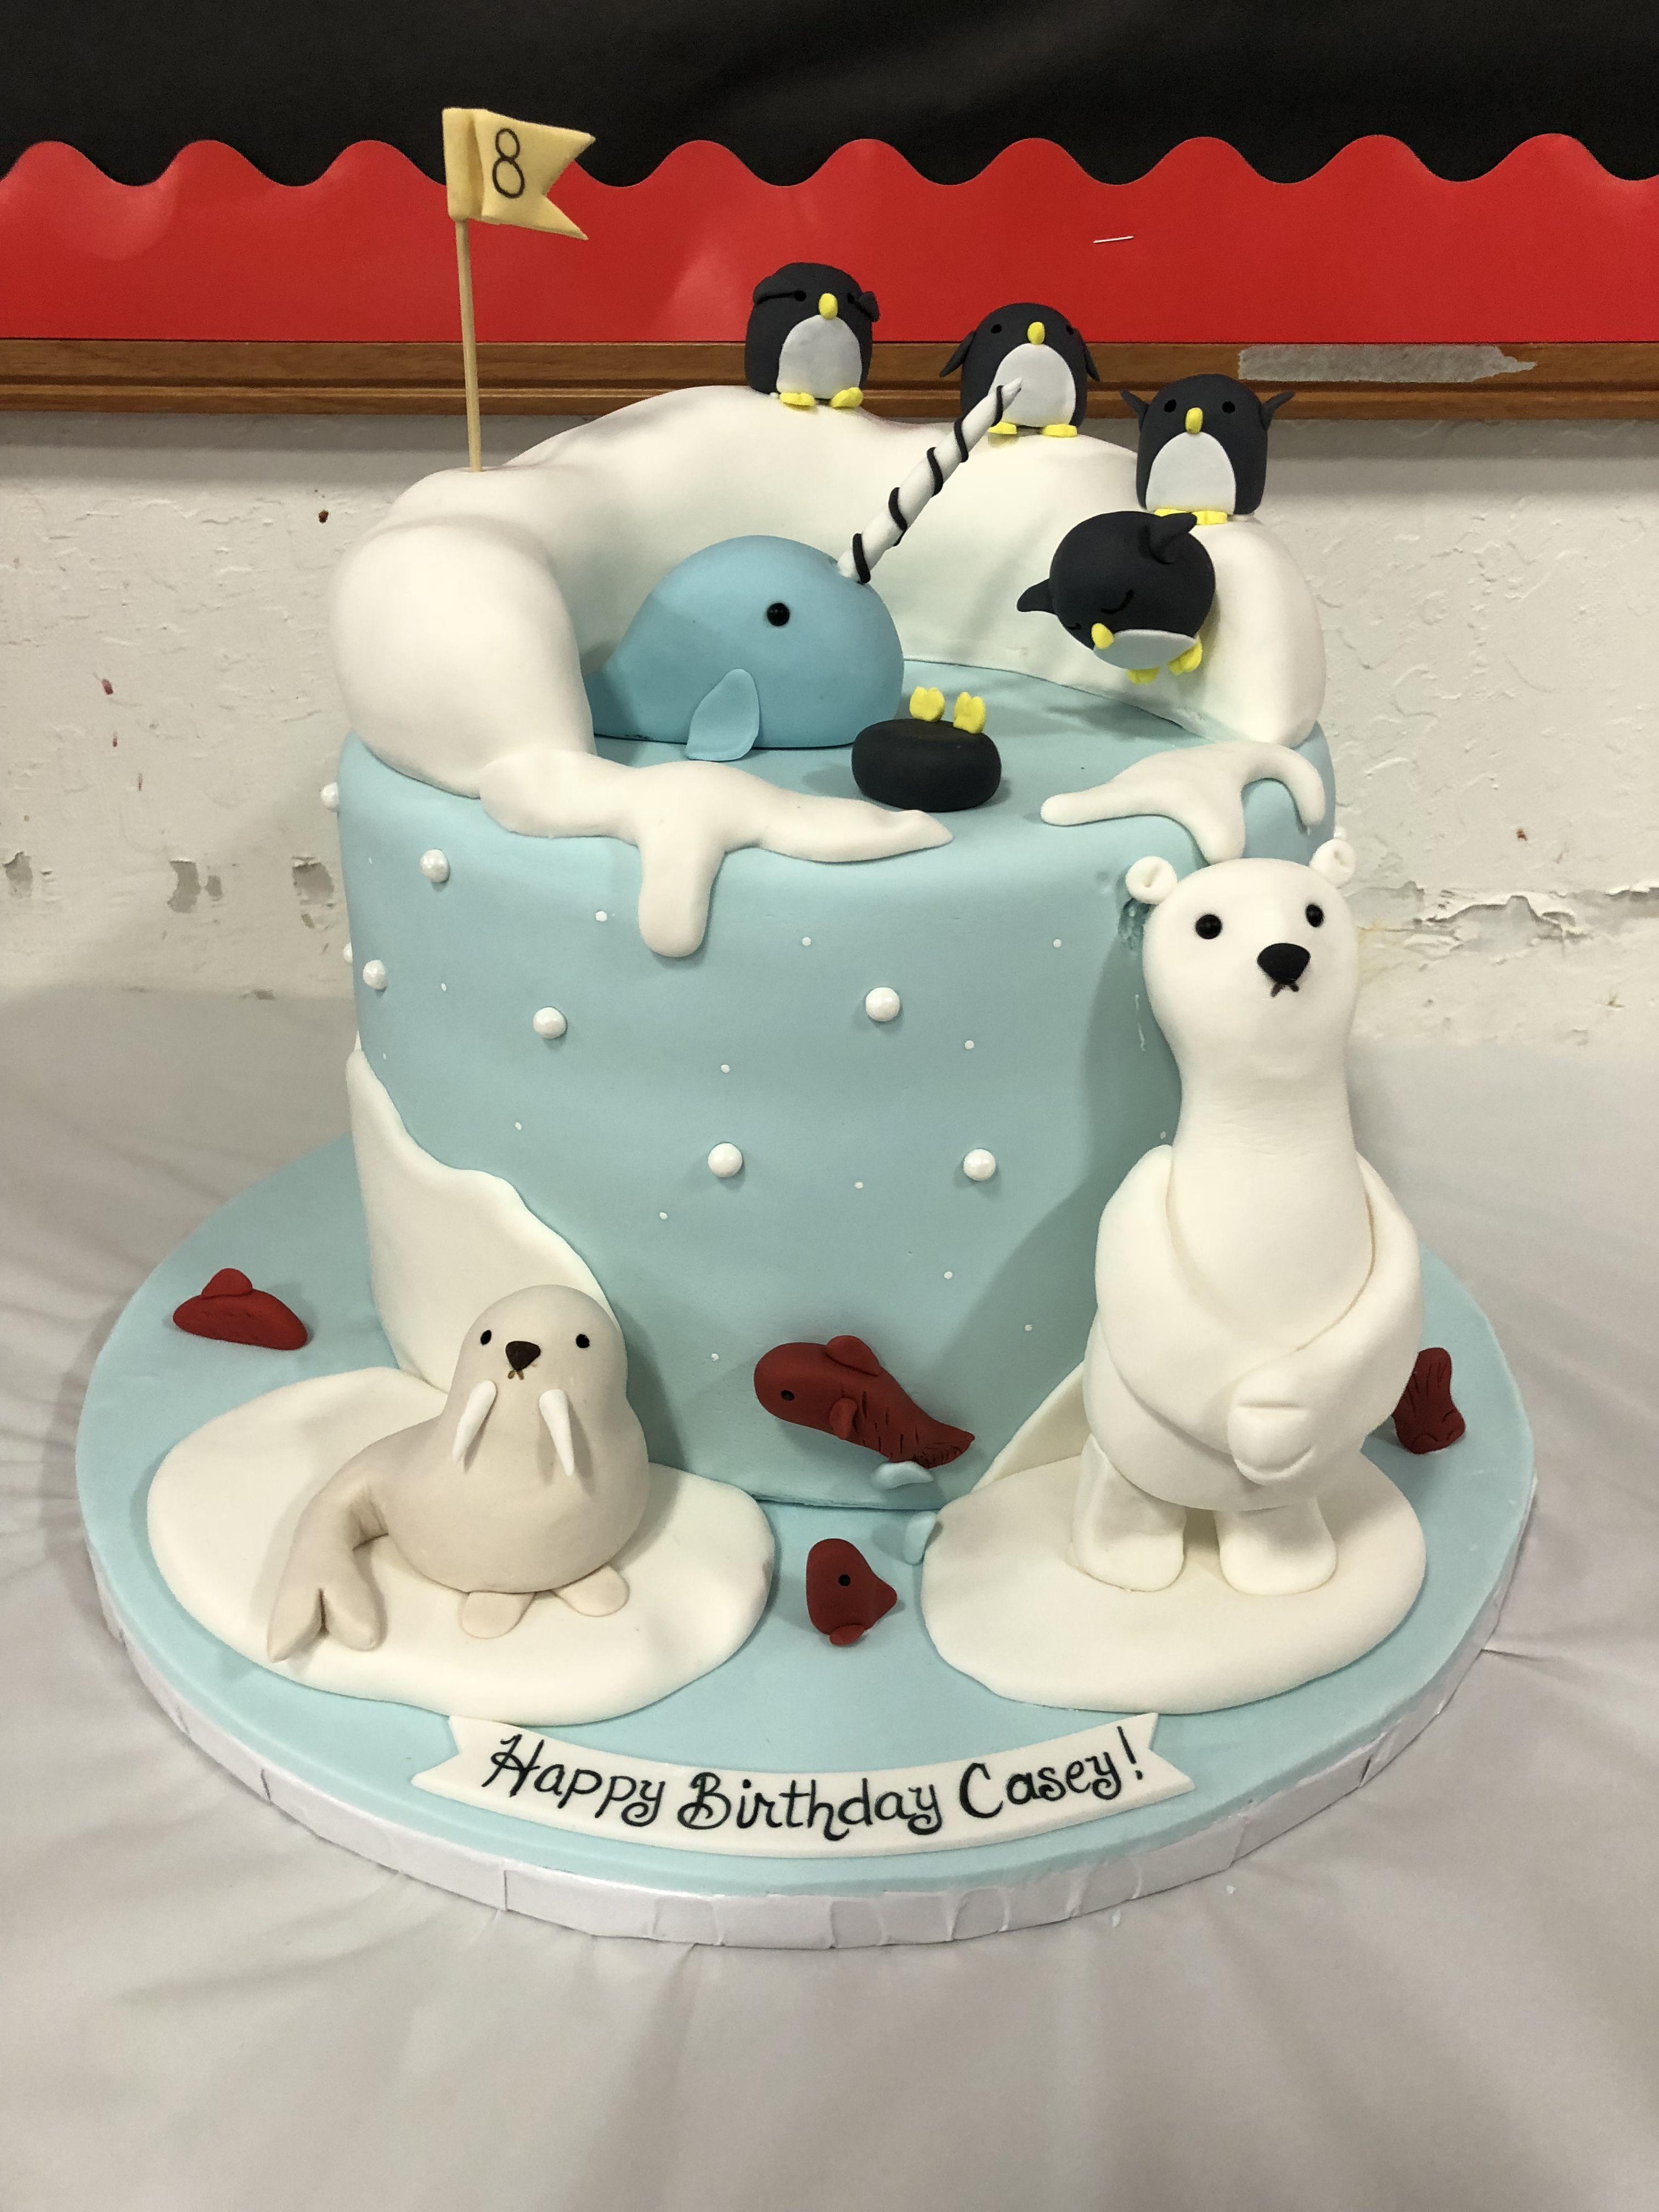 Narwhal Cake Cake Contest Ideas Pinterest Cake Birthday Cake